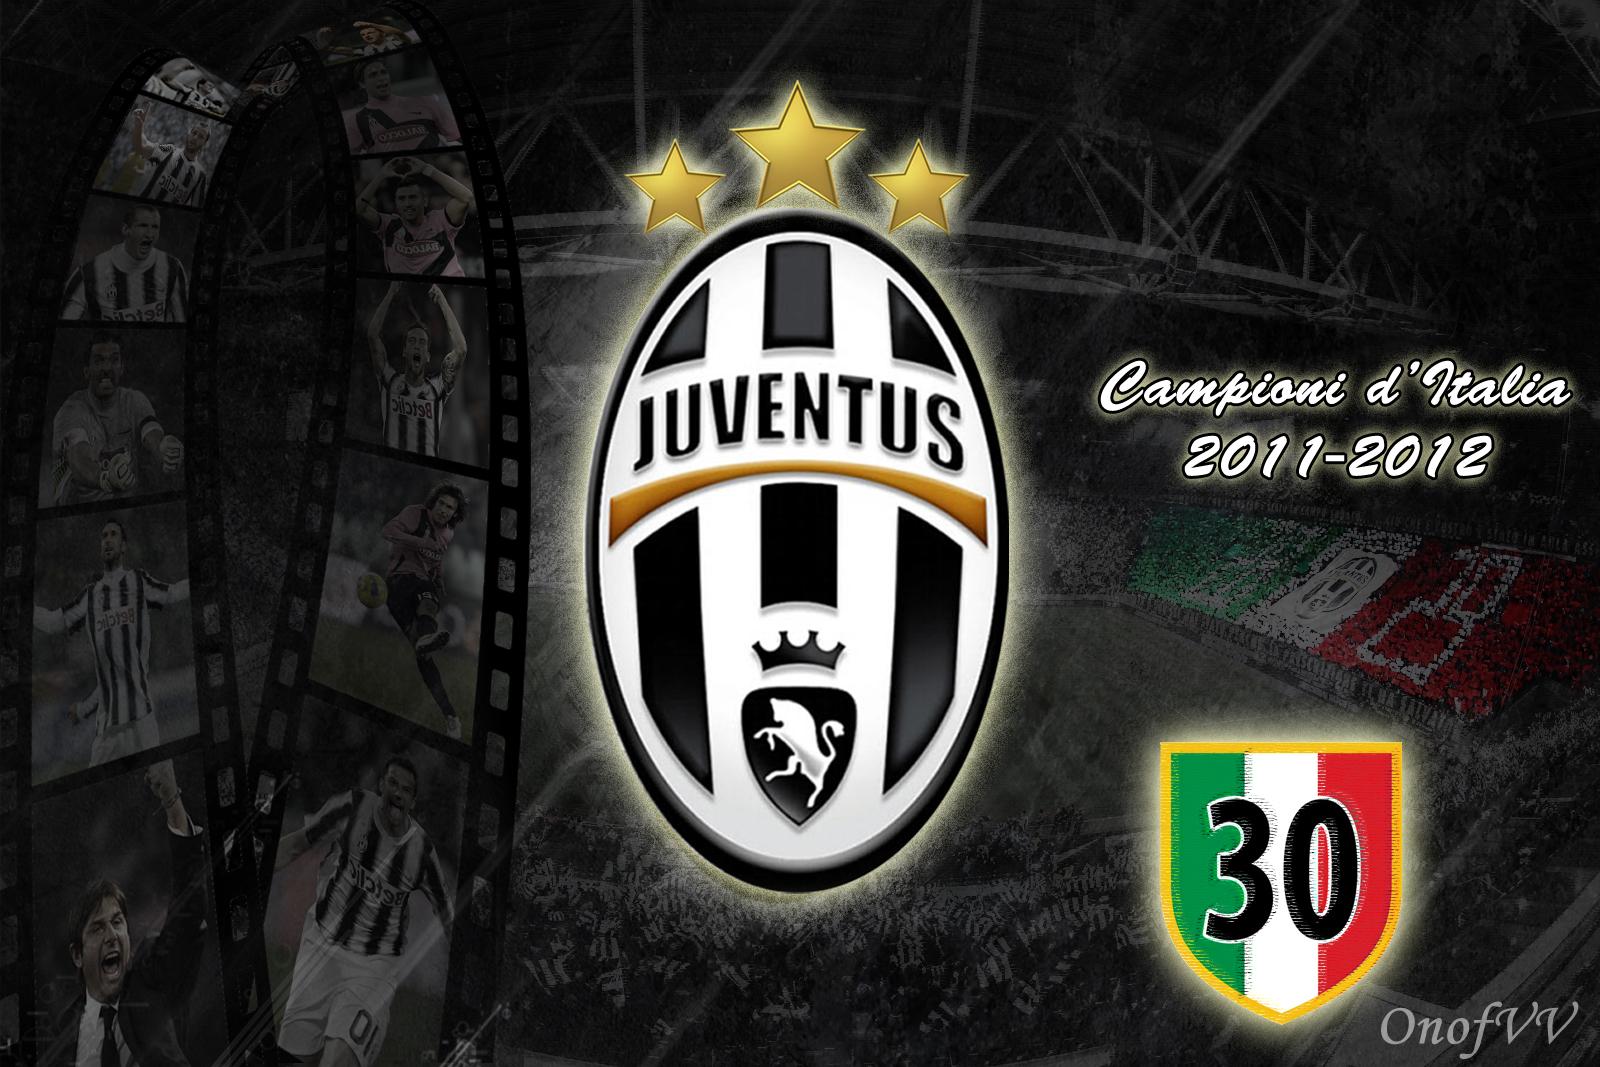 Sfondi juventus campione d 39 italia hd for Sfondi hd juventus